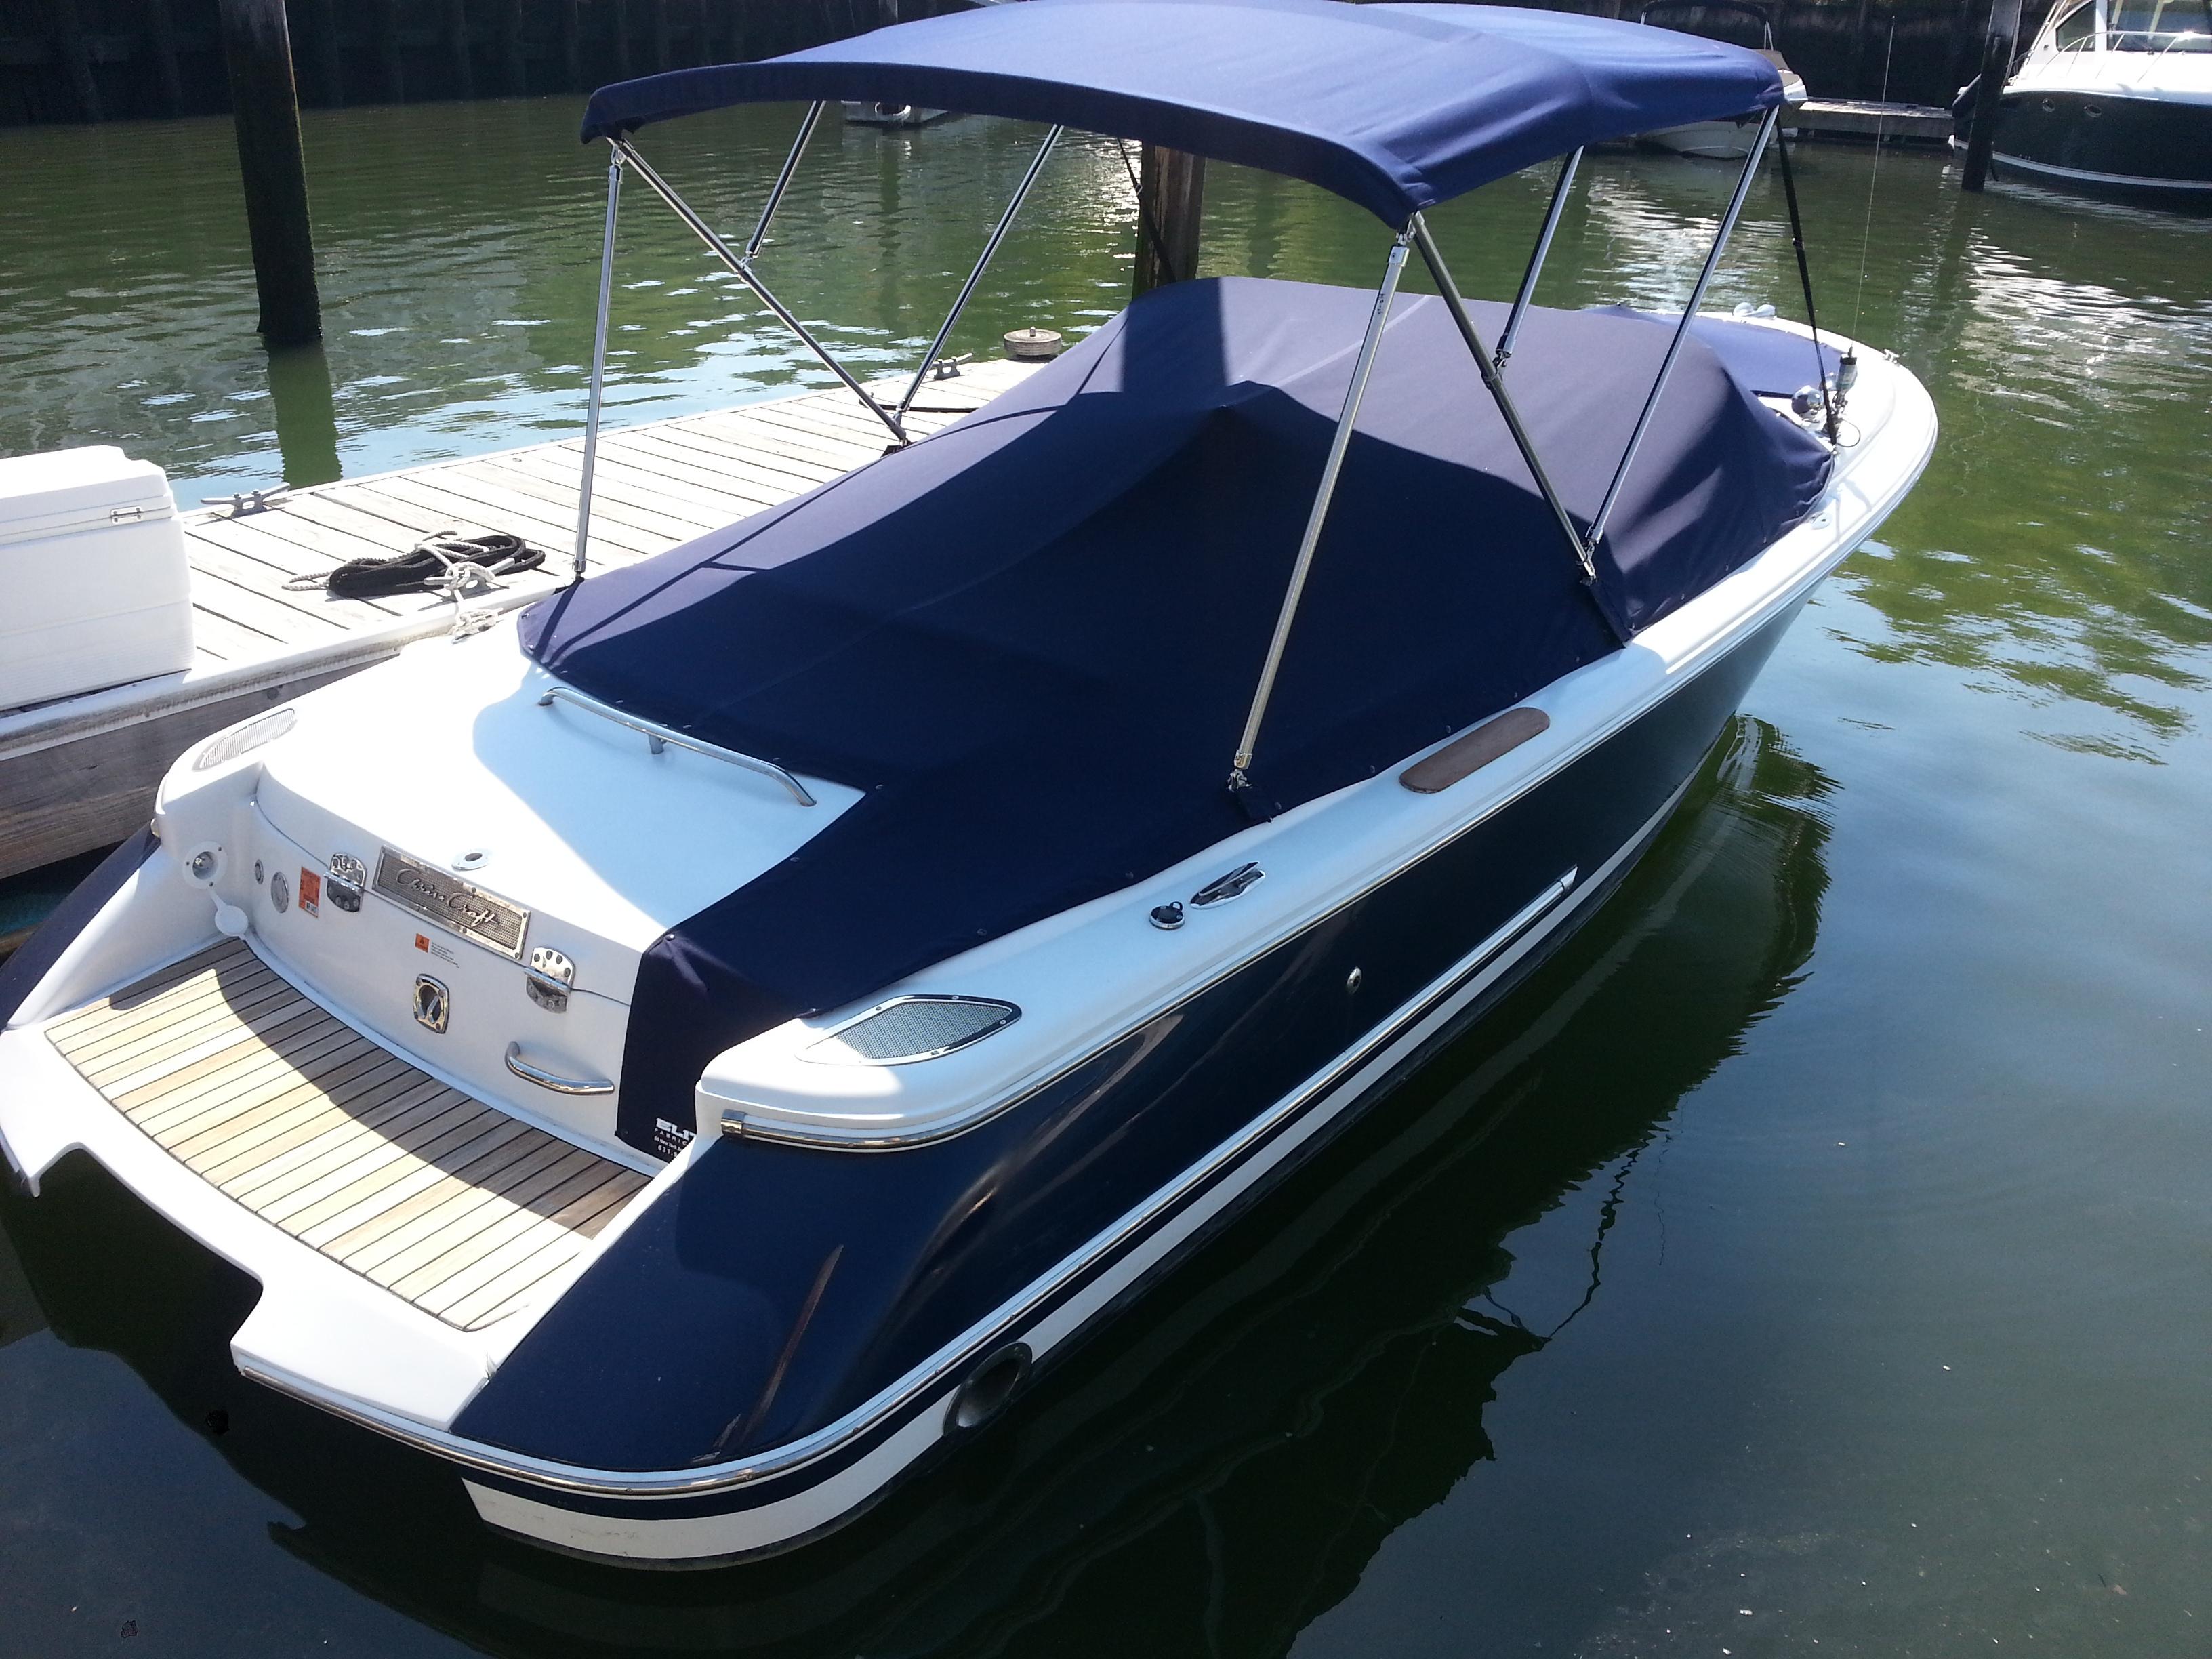 Chris Craft 22' Launch - Knutson's Yacht Haven Marina